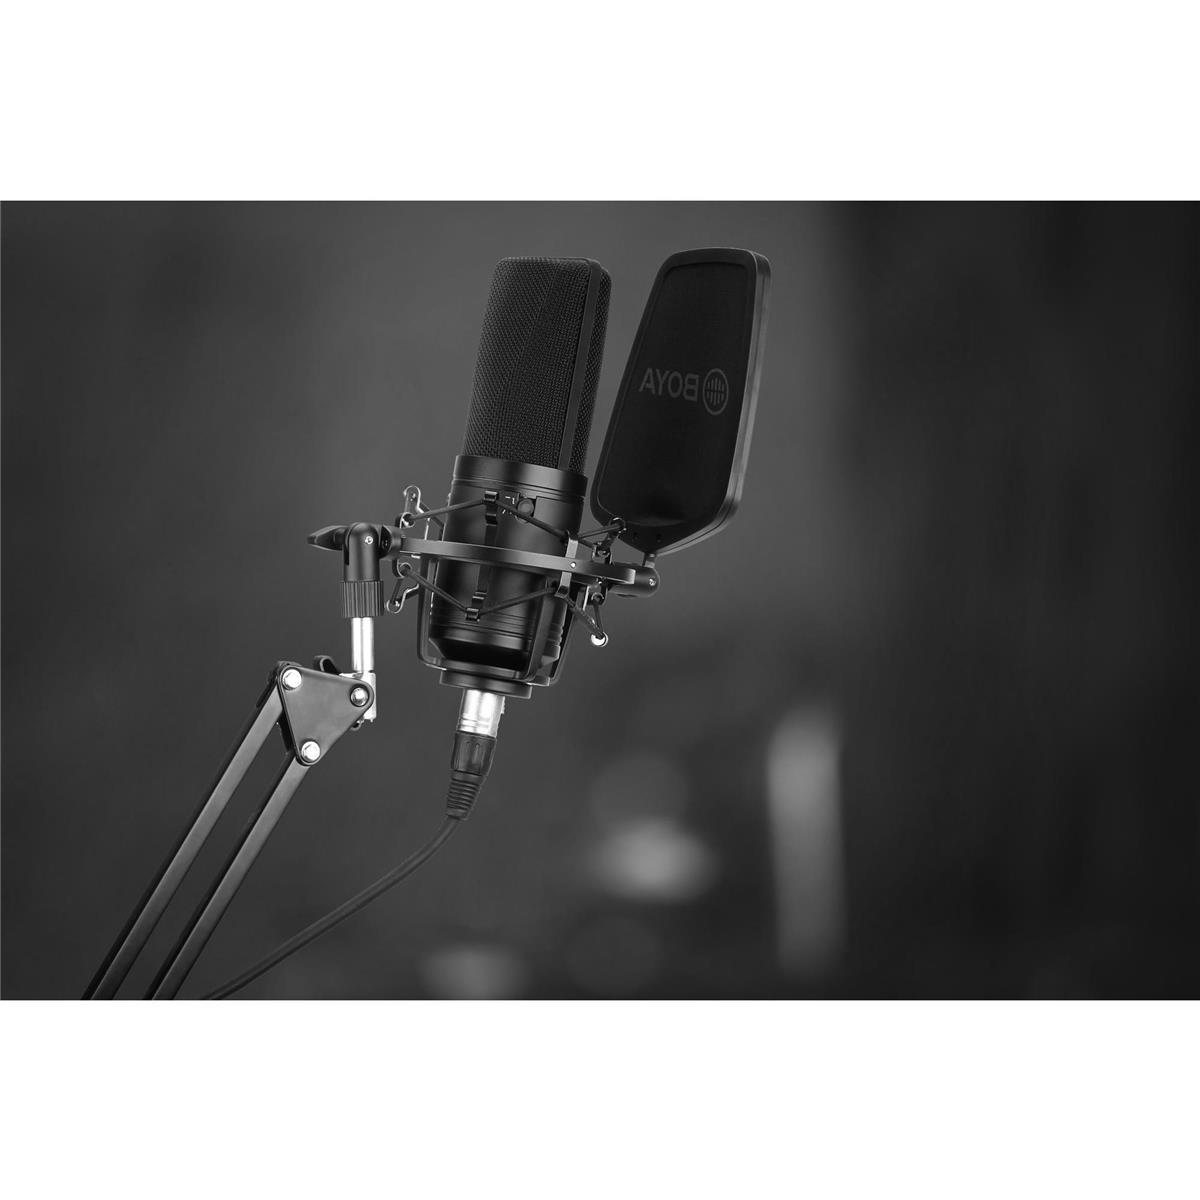 BOYA BY-M1000 Large Diaphragm Condenser Microphone